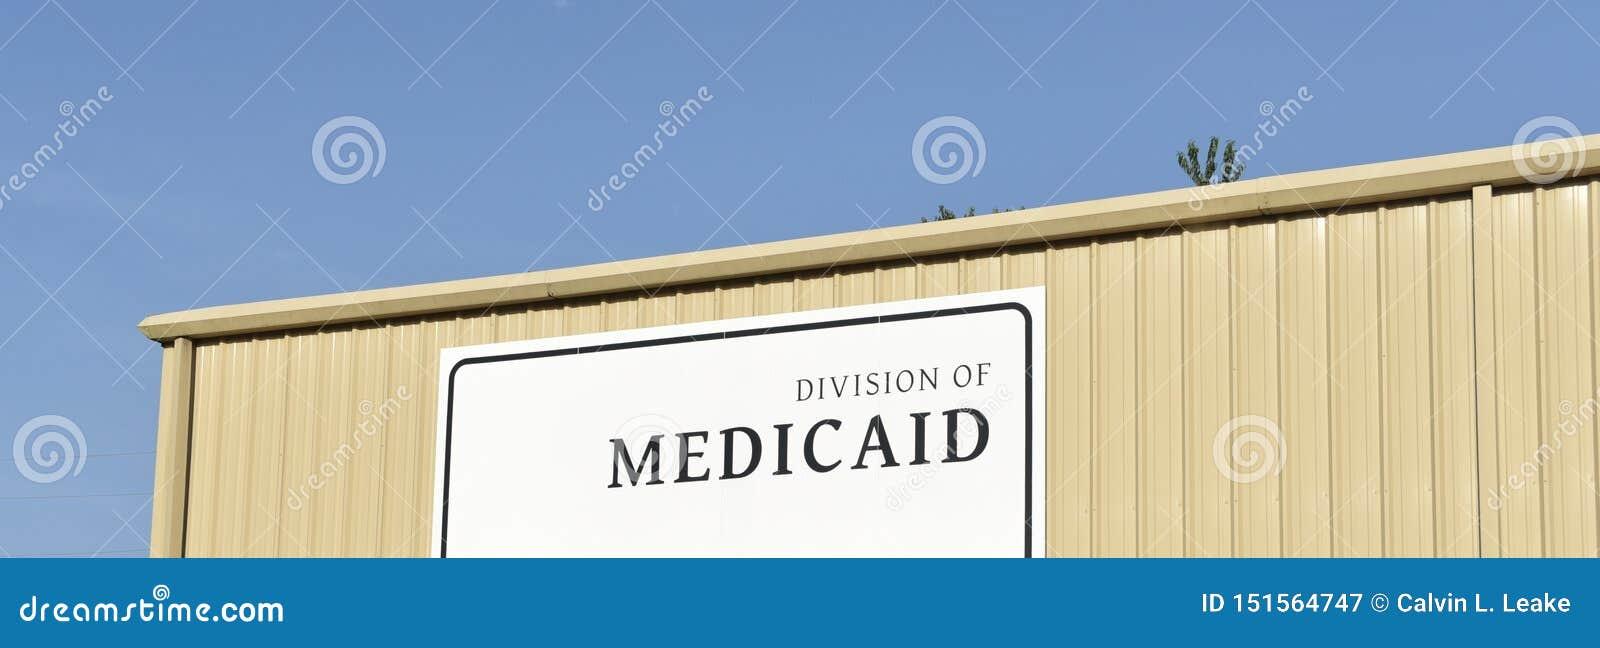 Medicaid-Abteilung